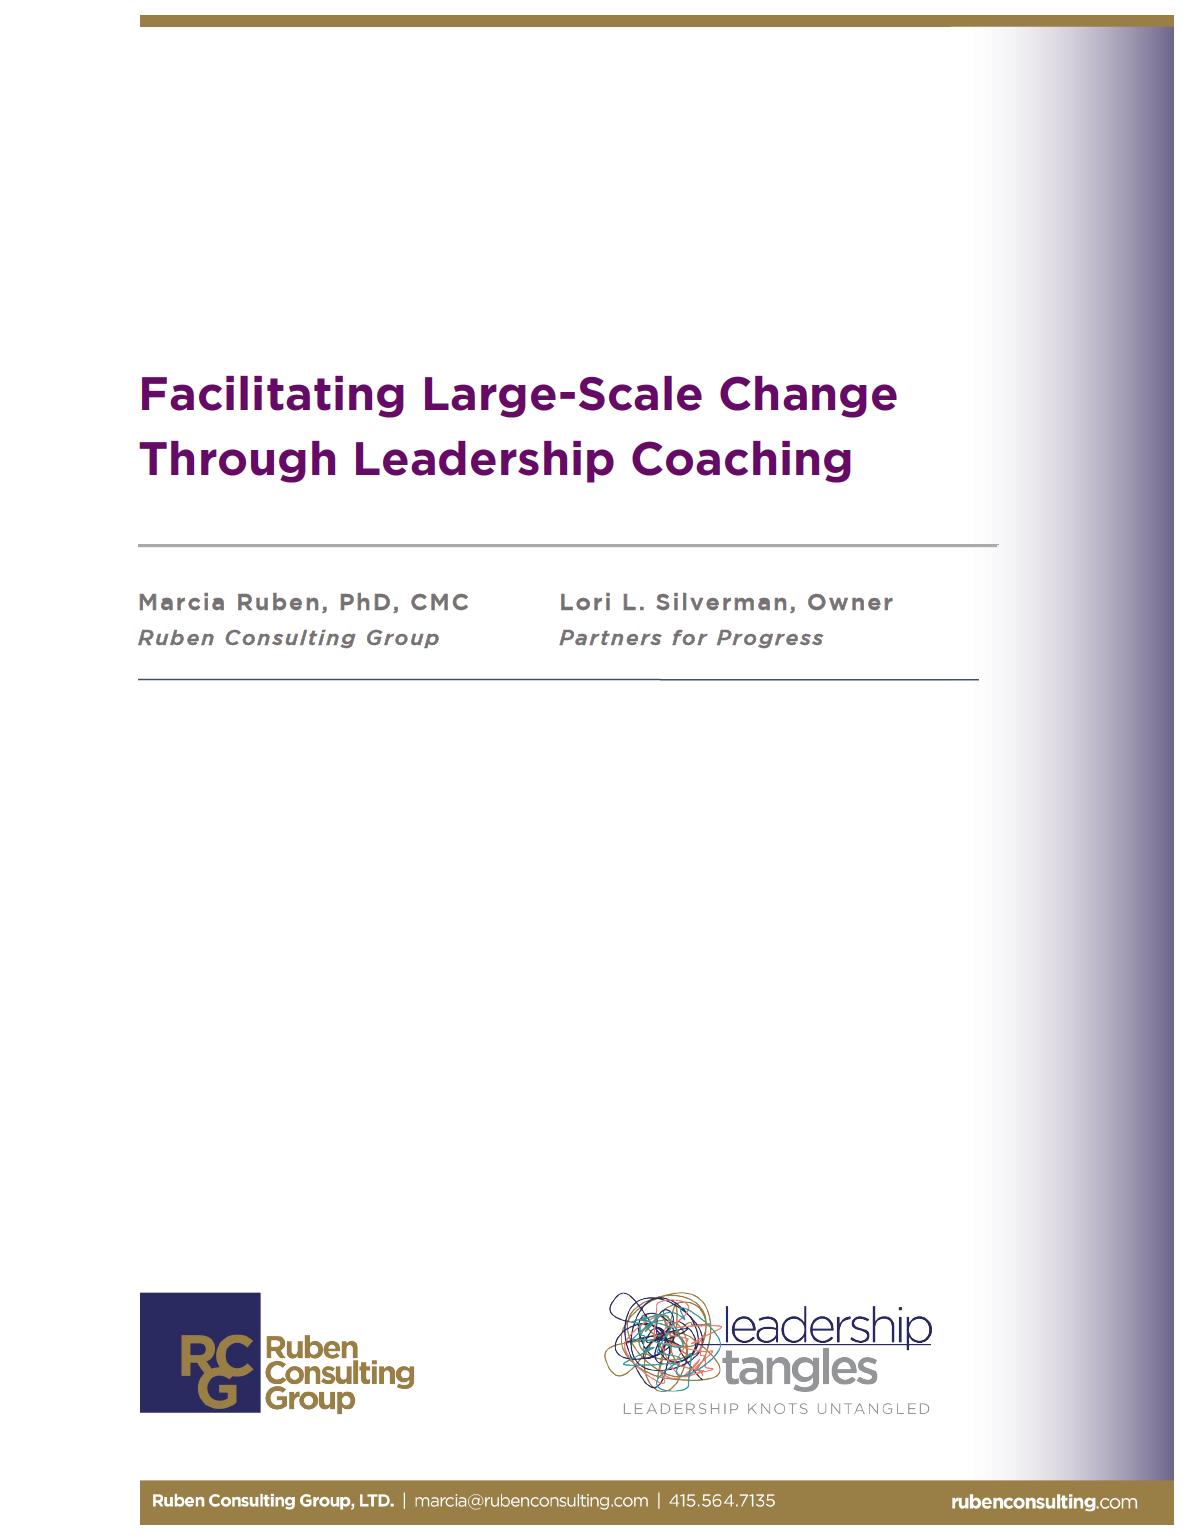 Facilitating Large Scale Change Through Leadership Coaching